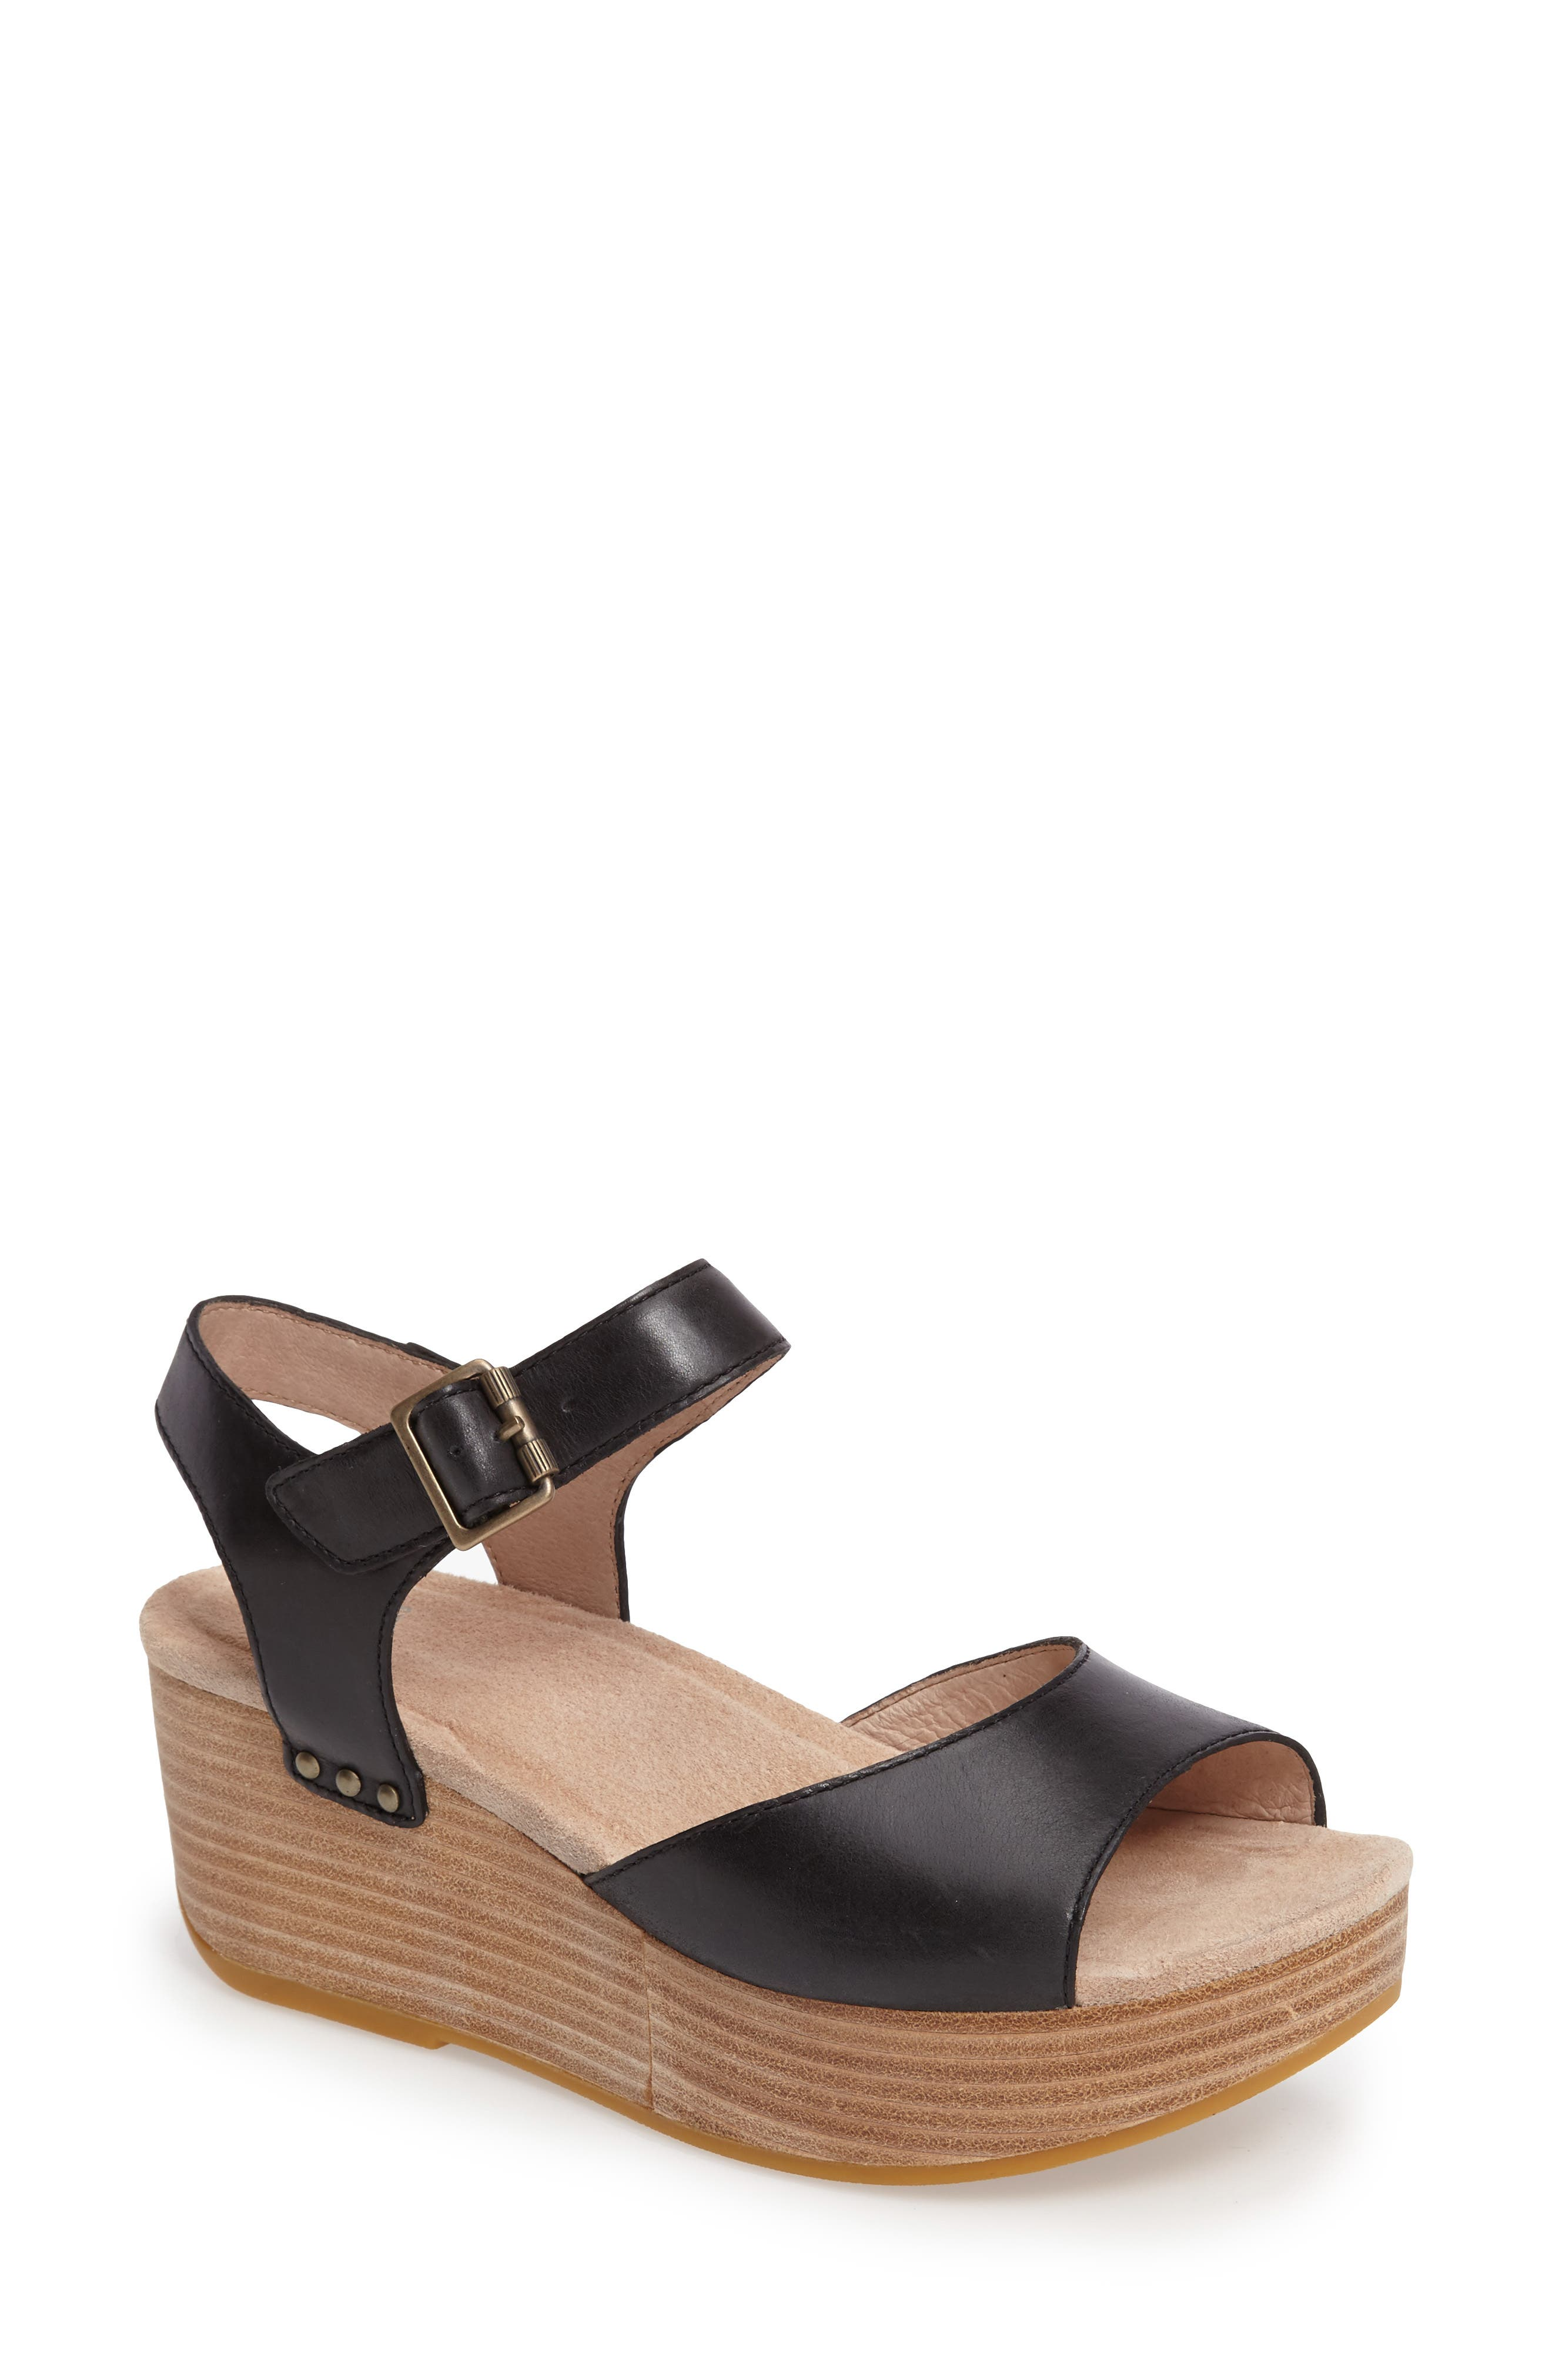 Alternate Image 1 Selected - Dansko Silvie Platform Wedge Sandal (Women)